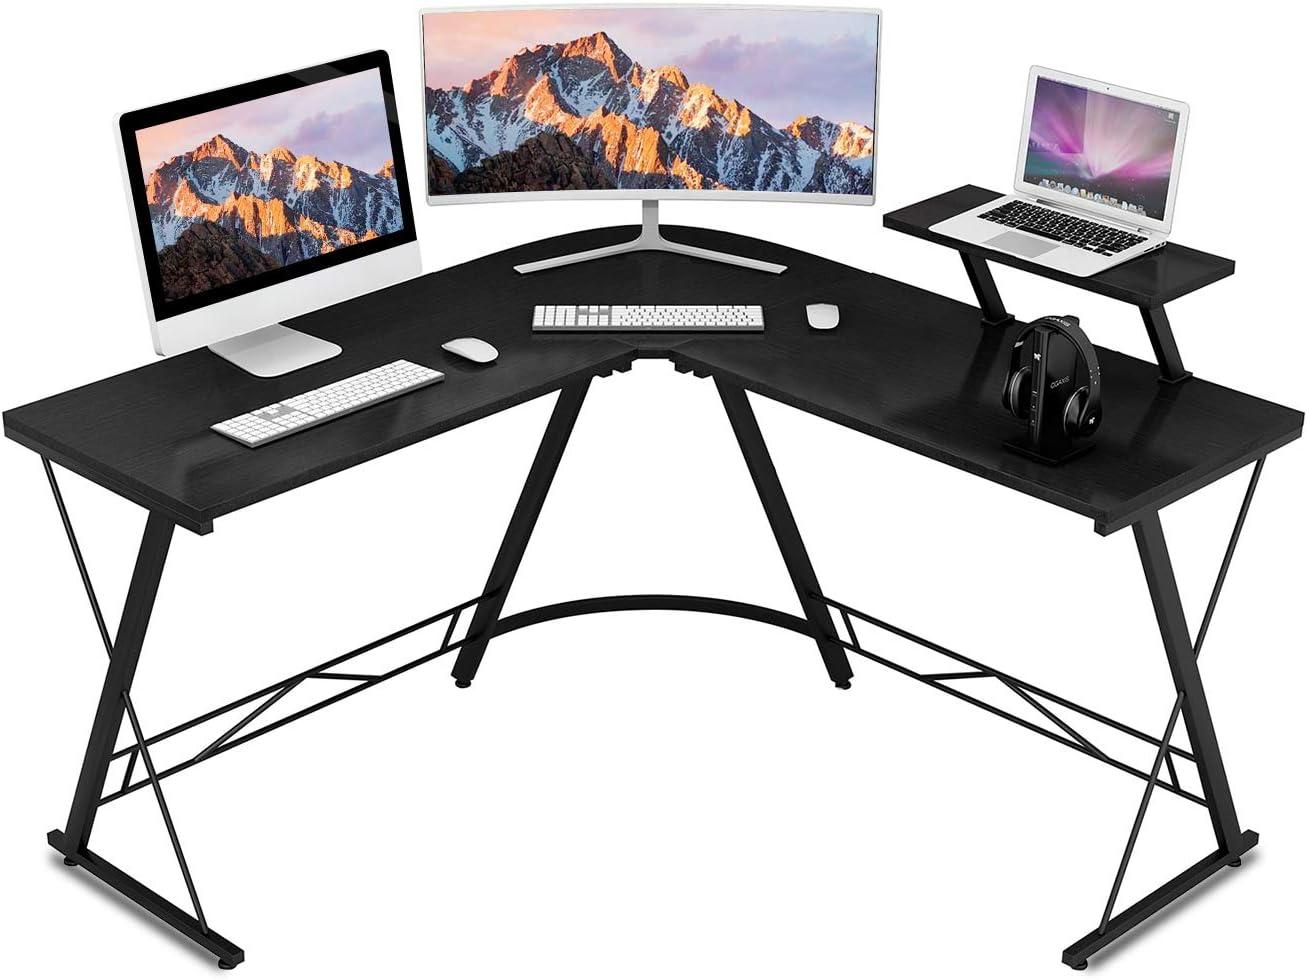 Hanamichi L Shaped Desk Home Office Desk, Gaming Computer Desk with Monitor Stand, Round Corner Desk for Home Office, Workstation, Bedroom,Living Room, Easy to Assemble, Black